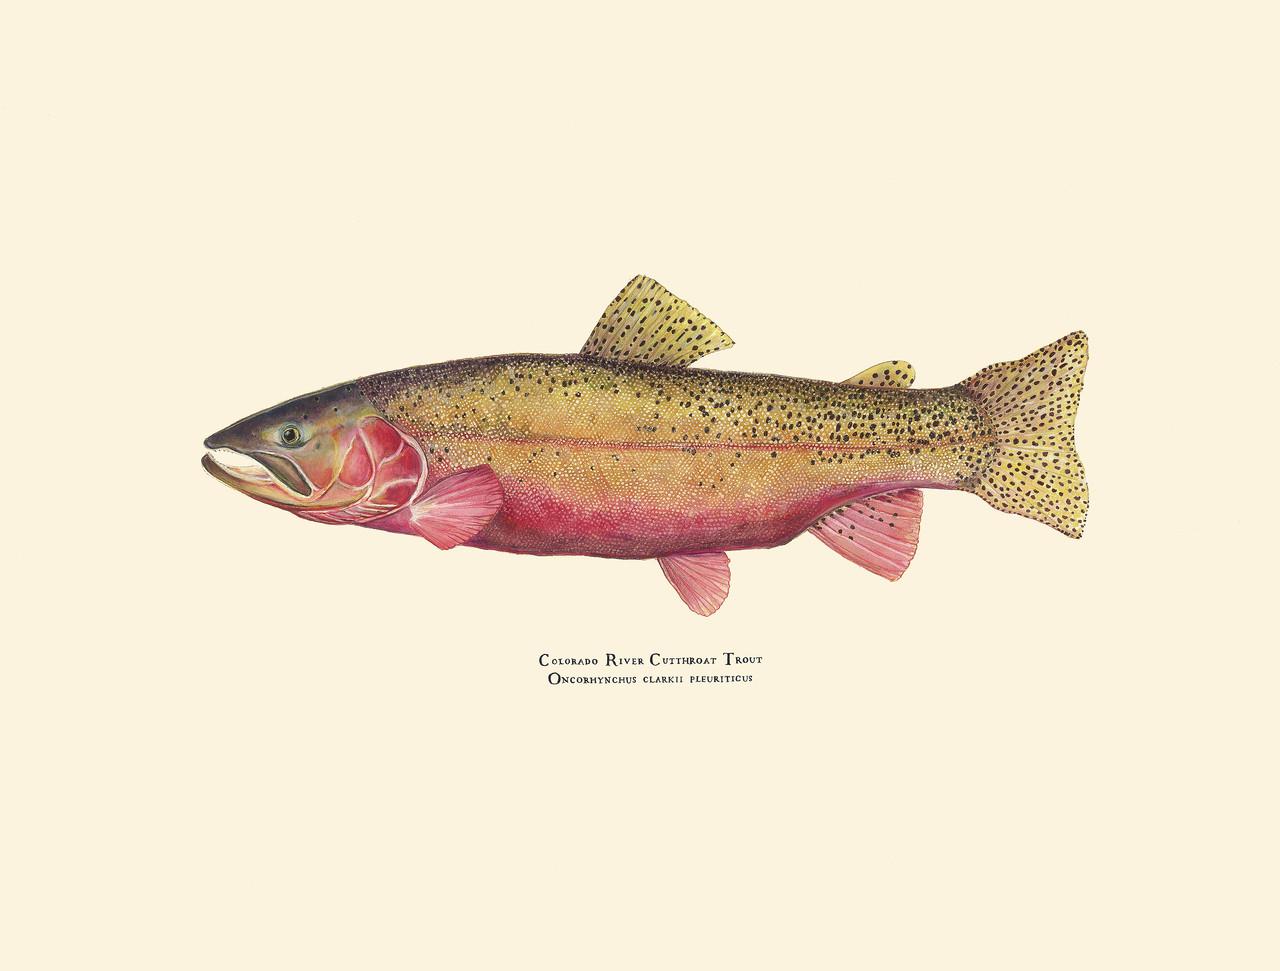 Colorado River Cutthroat Trout Oncorhynchus Clarki